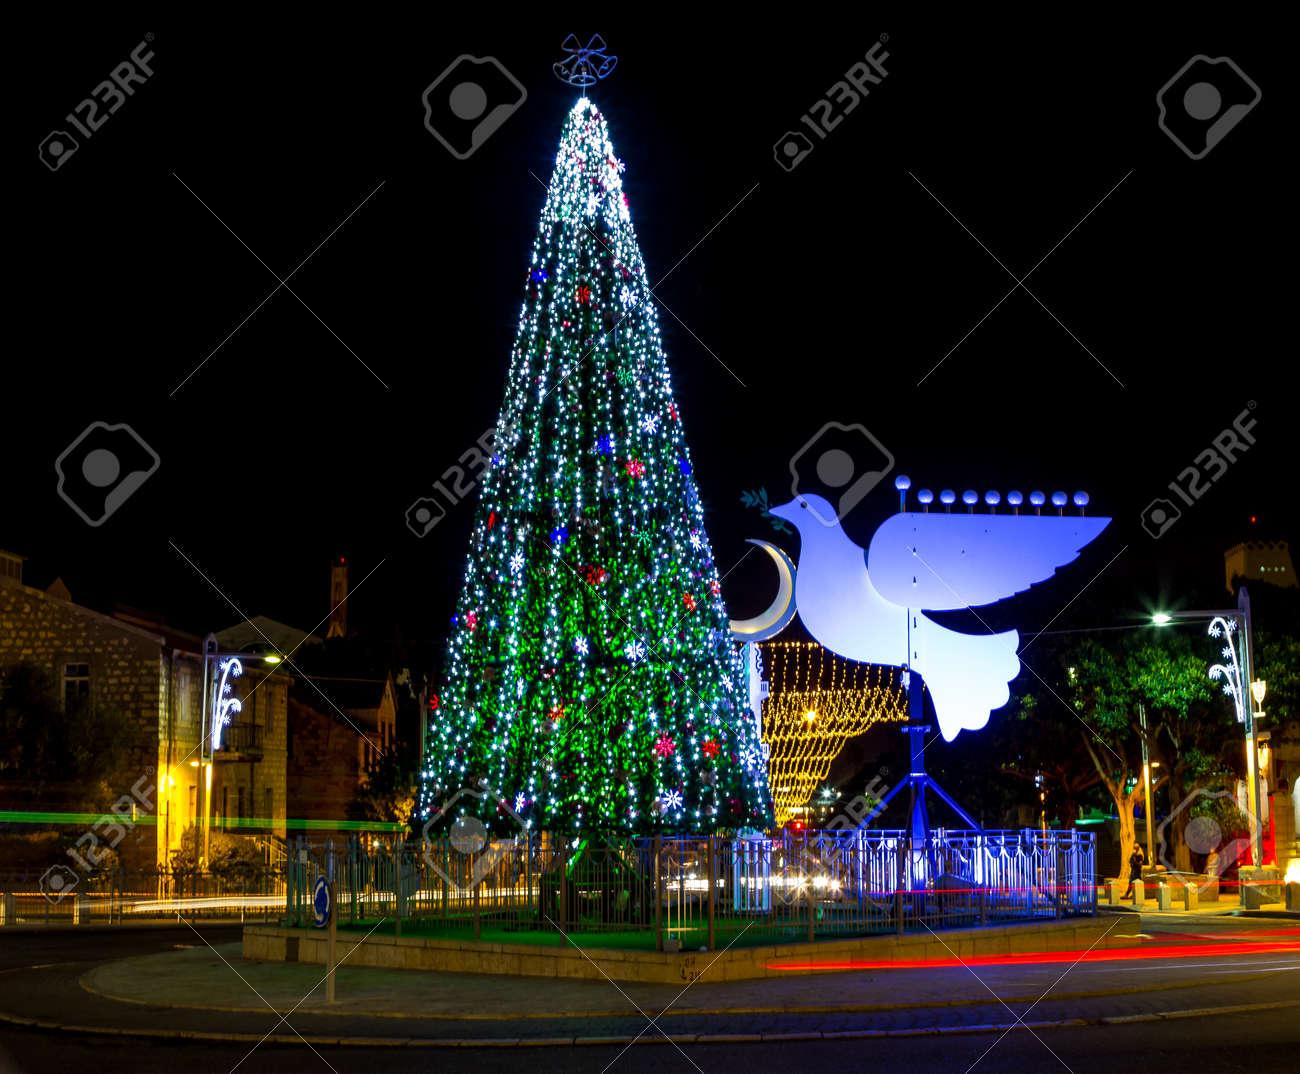 Christmas Hannakah.Christmas Tree And Hanukkah Menorah In The Form Of A Dove In